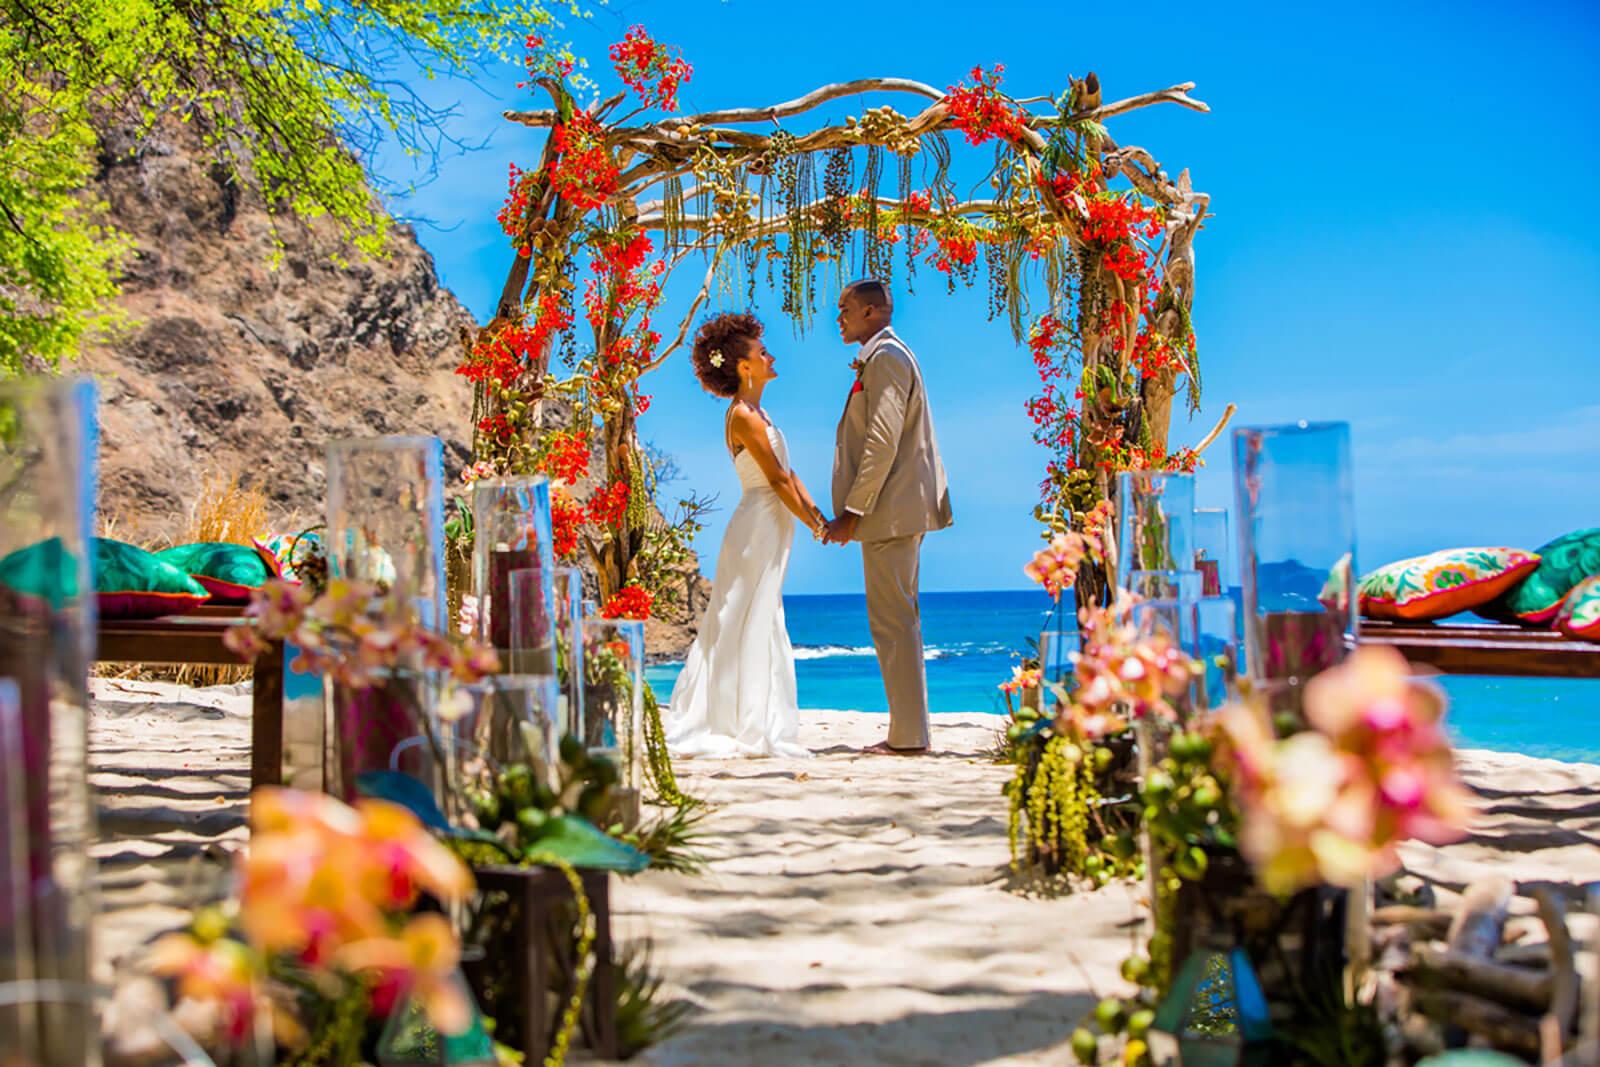 bridefriends-guide-to-destination-weddings-podcast-black-destination-bride-blackdesti-tropical-occassions-aimee-monihan-costa-rica-wedding-planner-episode-15-1.jpg